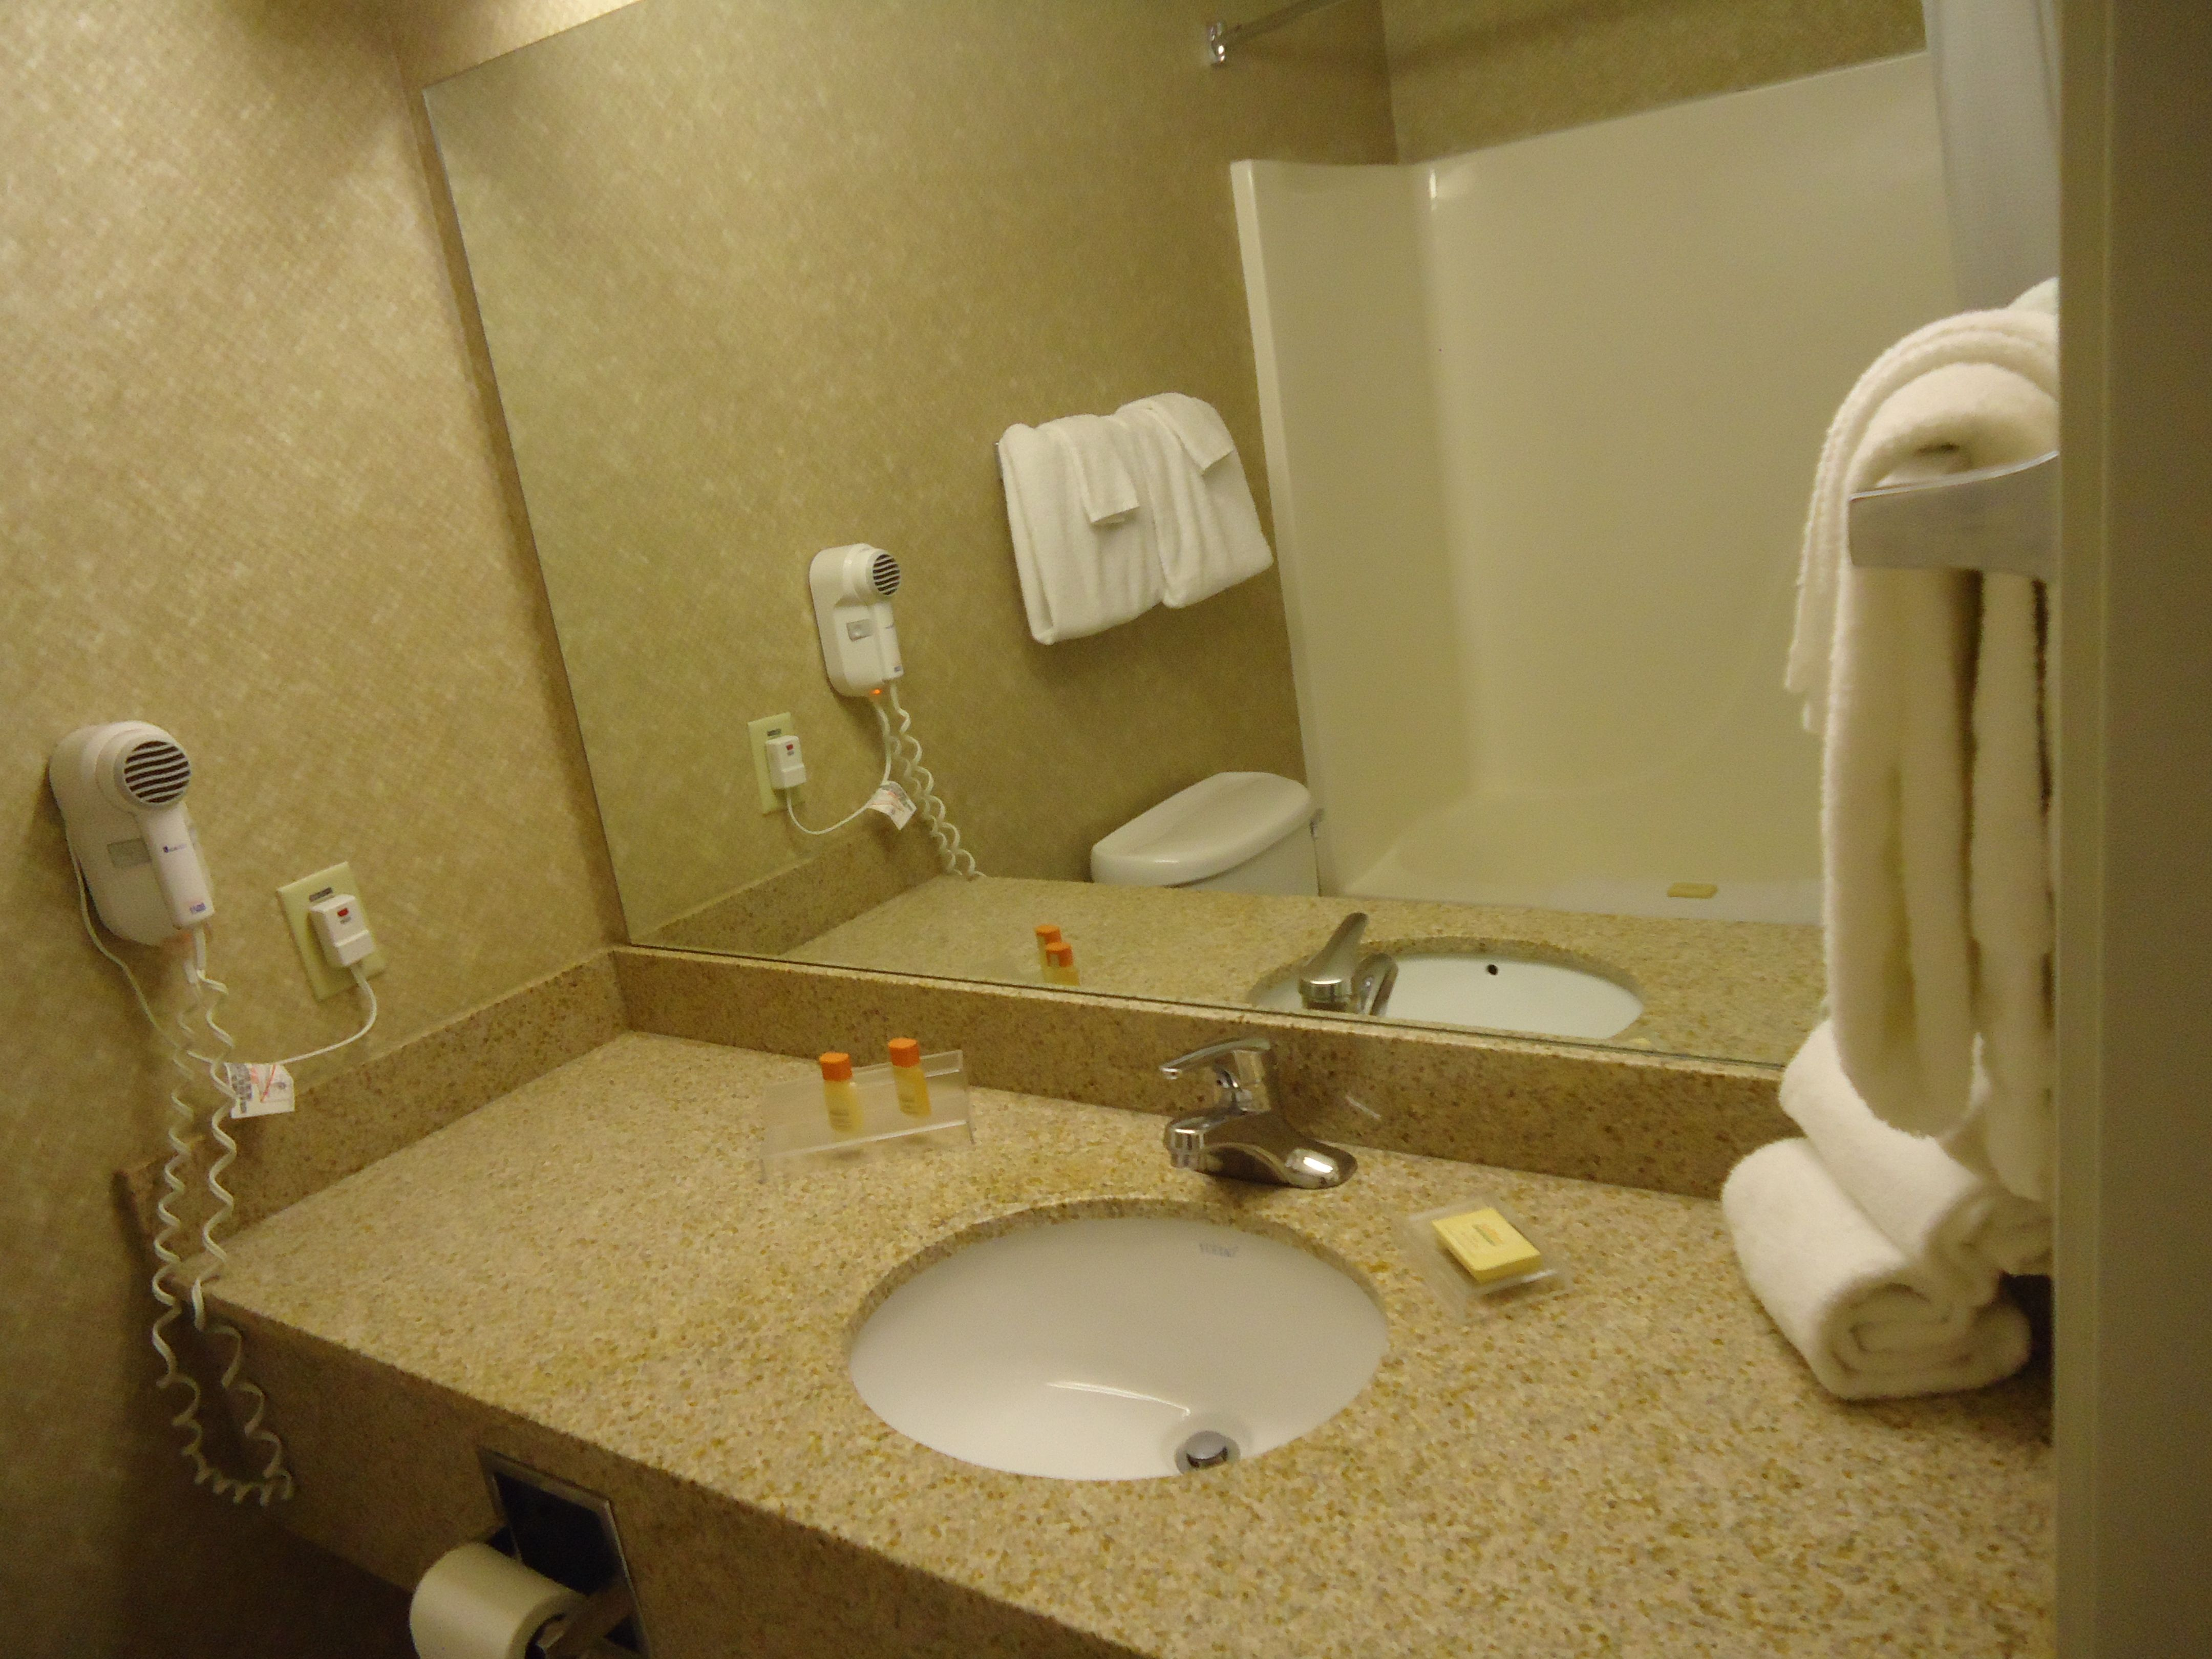 Bath Tub, Hairdryer, Shower, Sink | Accommodation & dining at Super ...